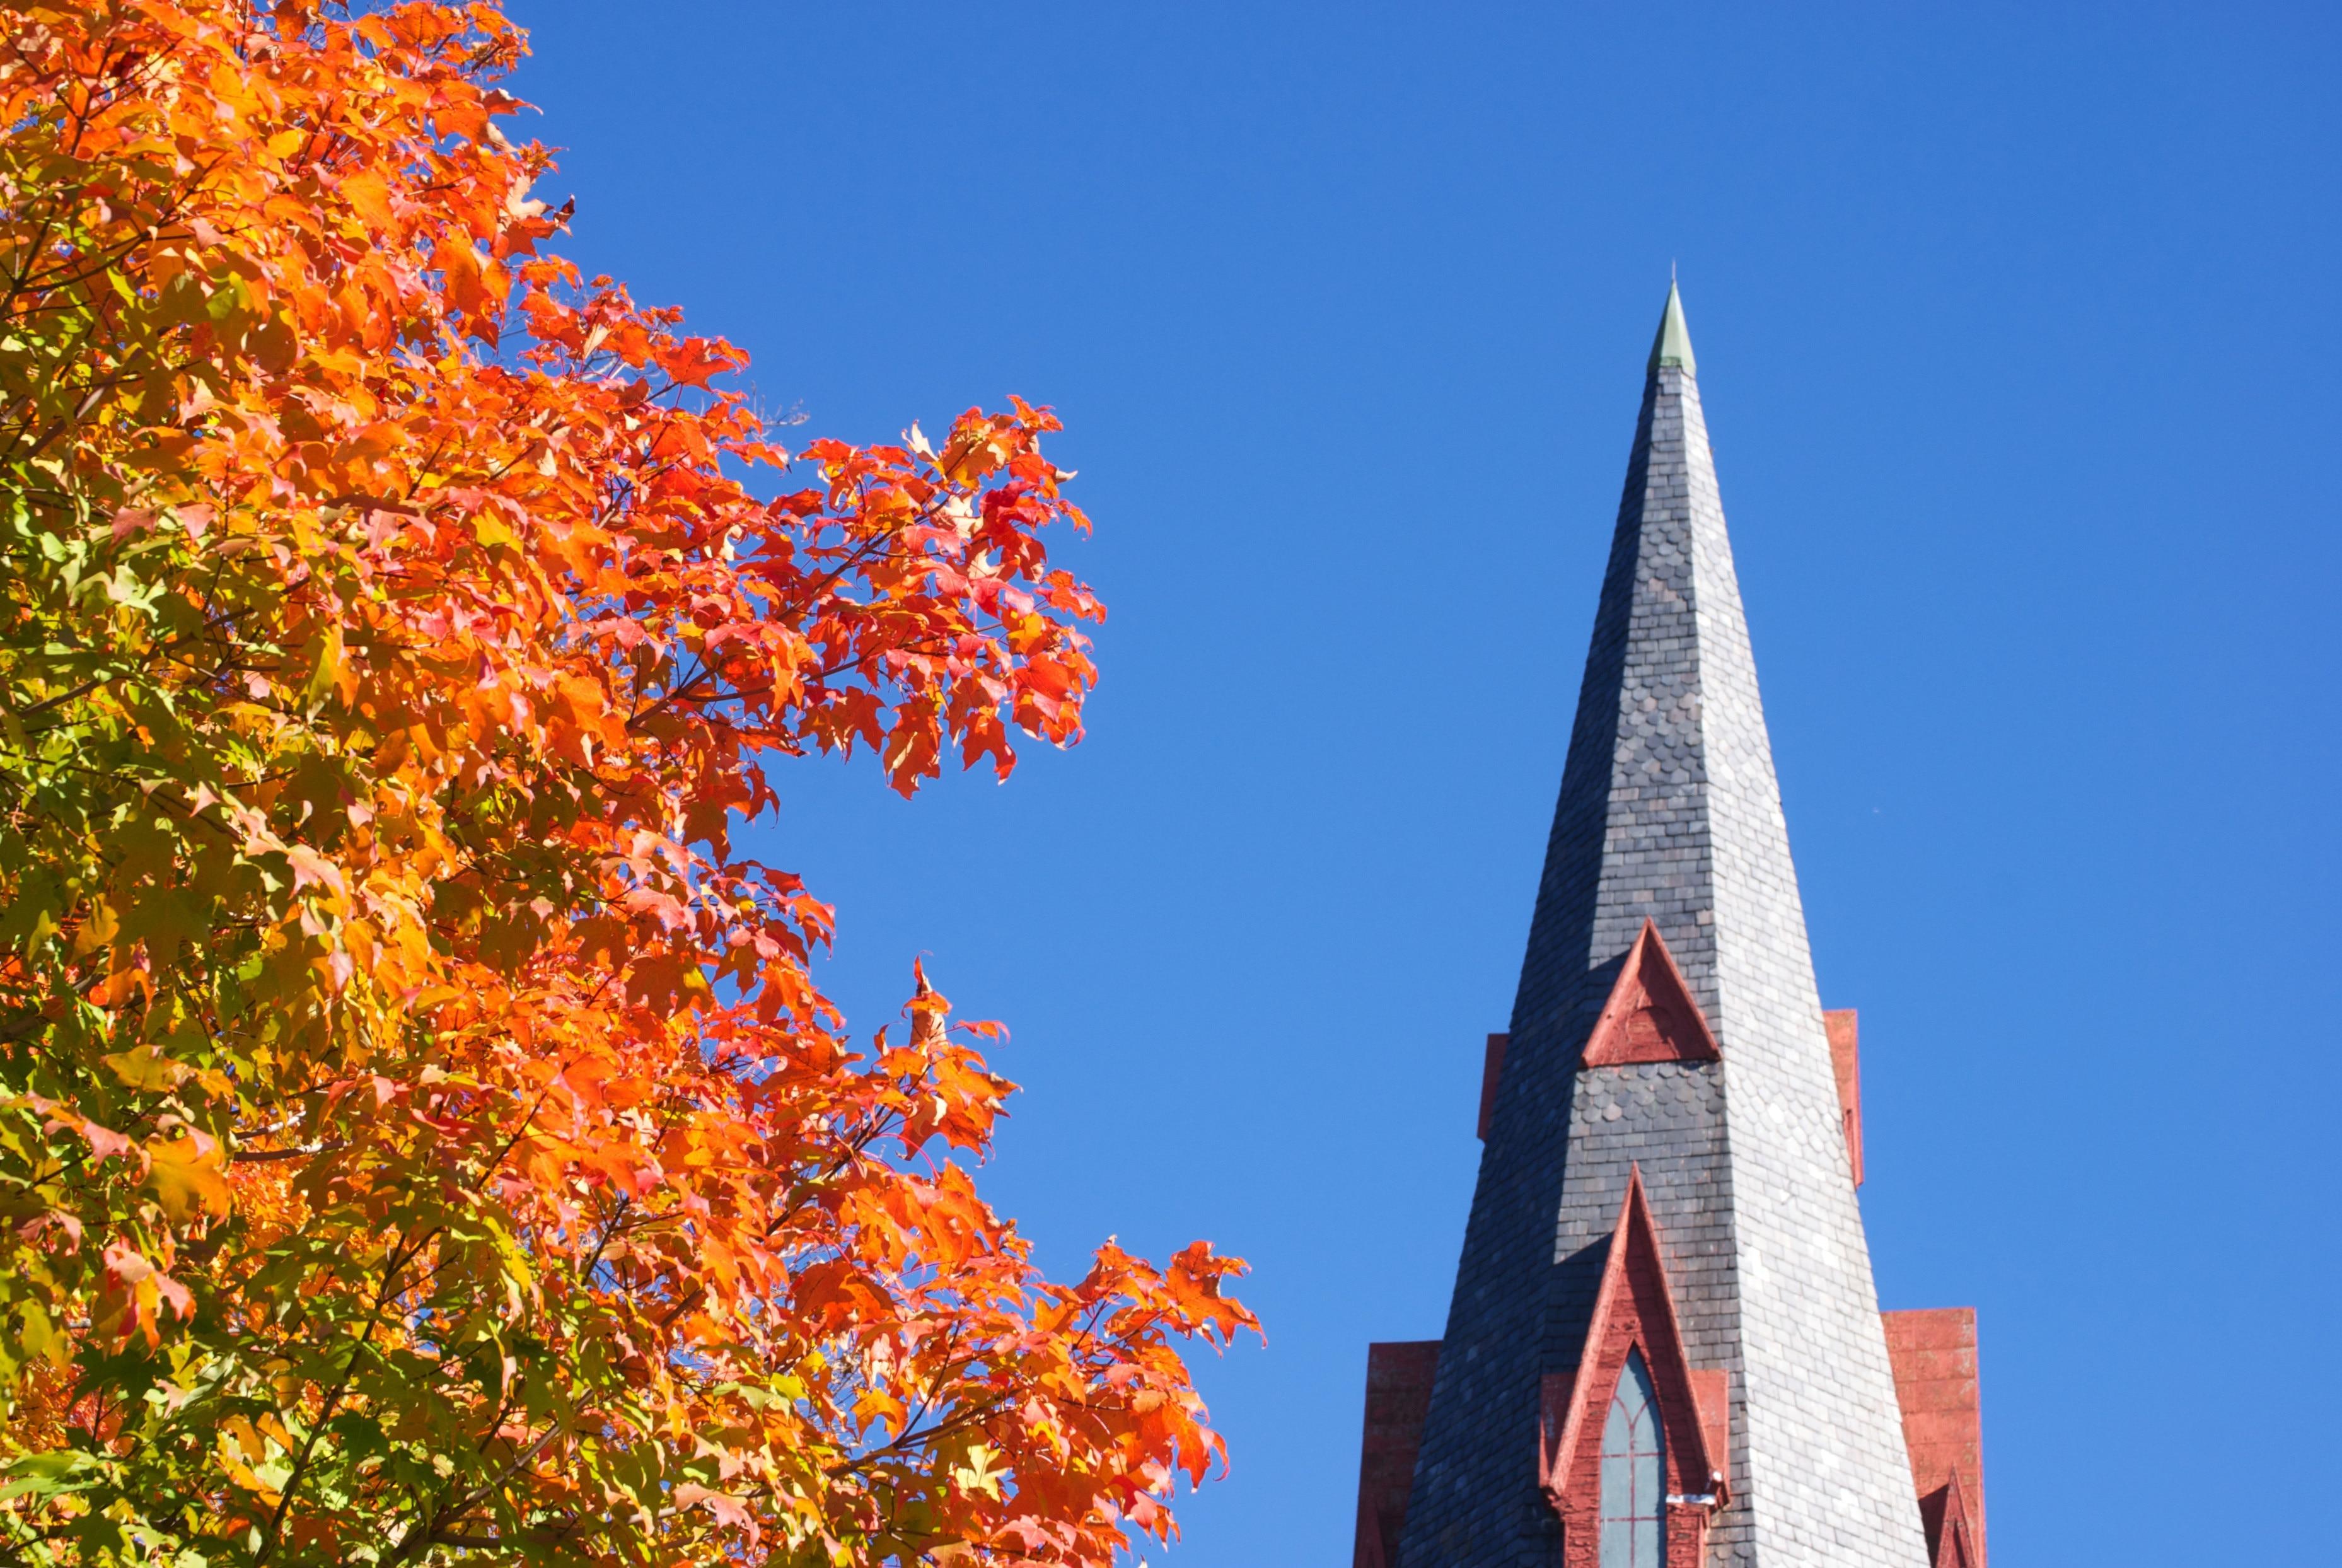 Shelburne, Vermont, United States of America